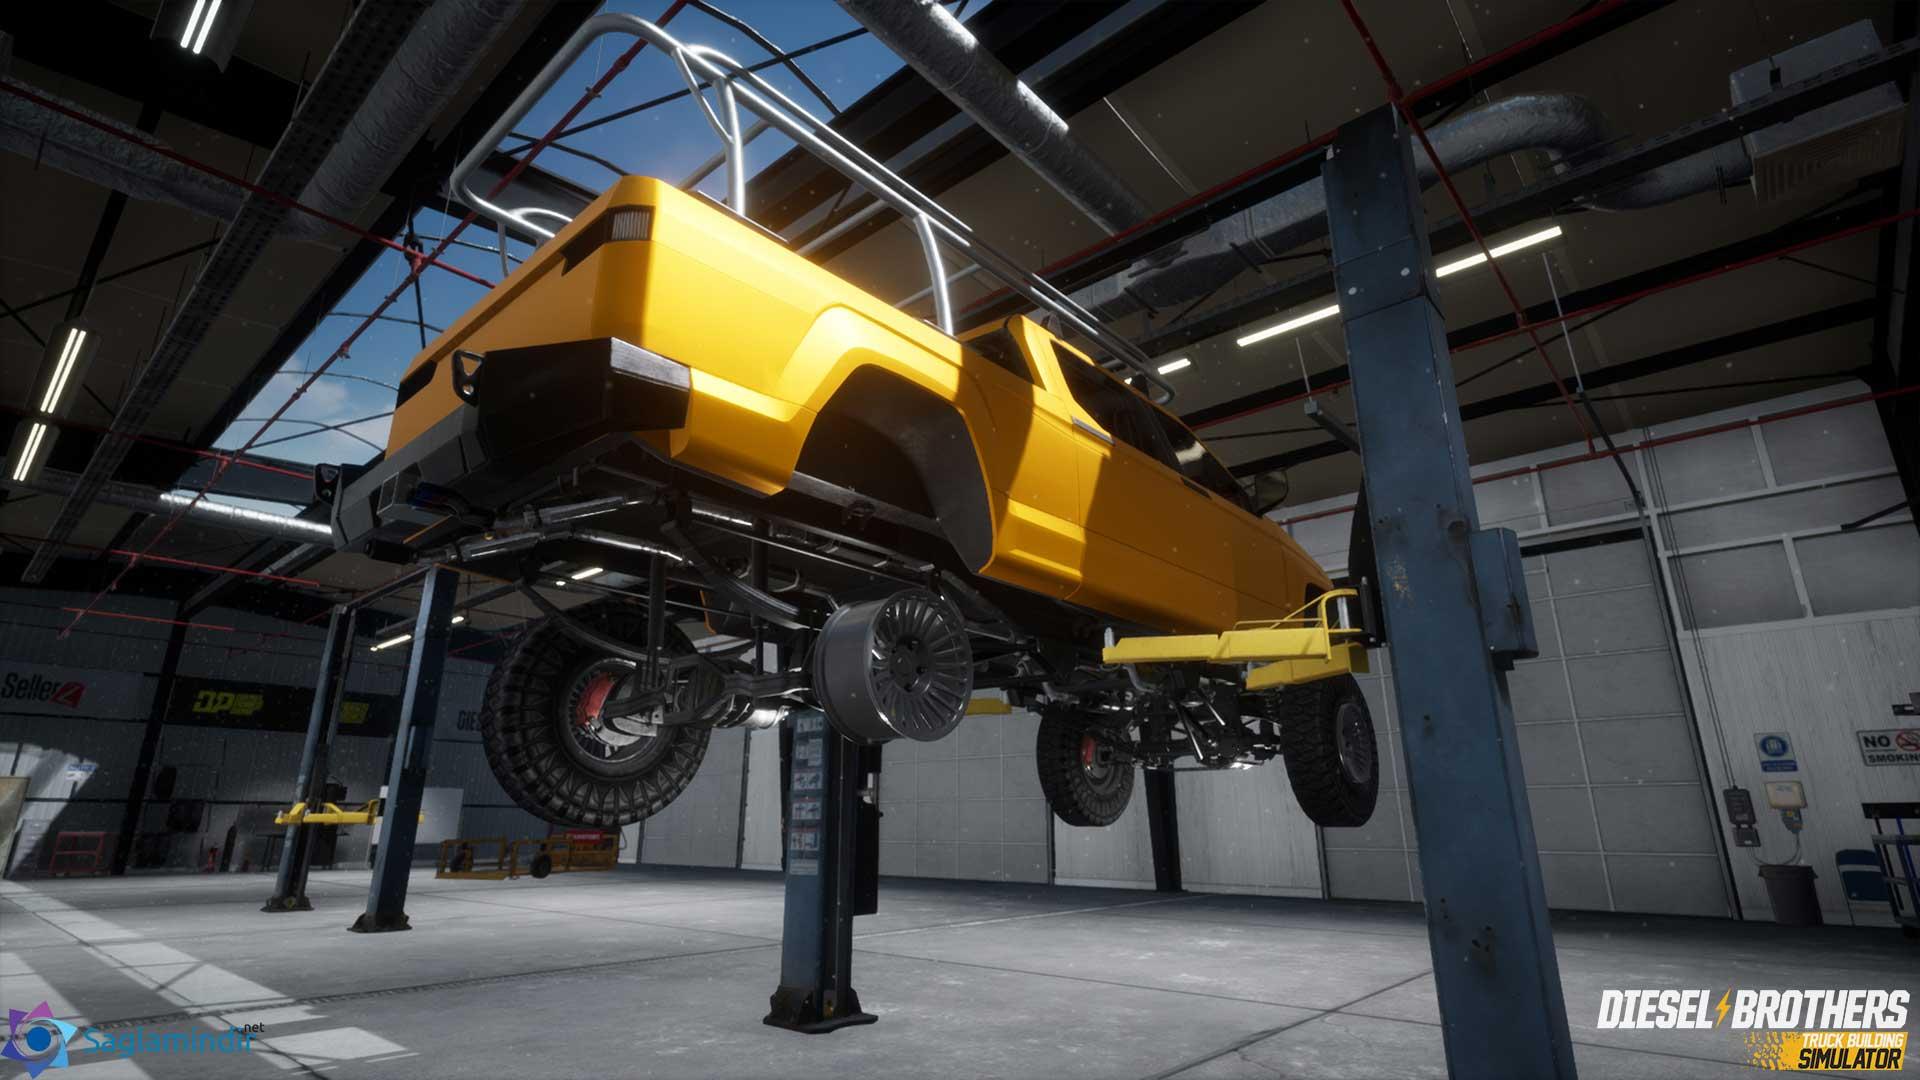 Diesel Brothers Truck Building Simulator saglamindir